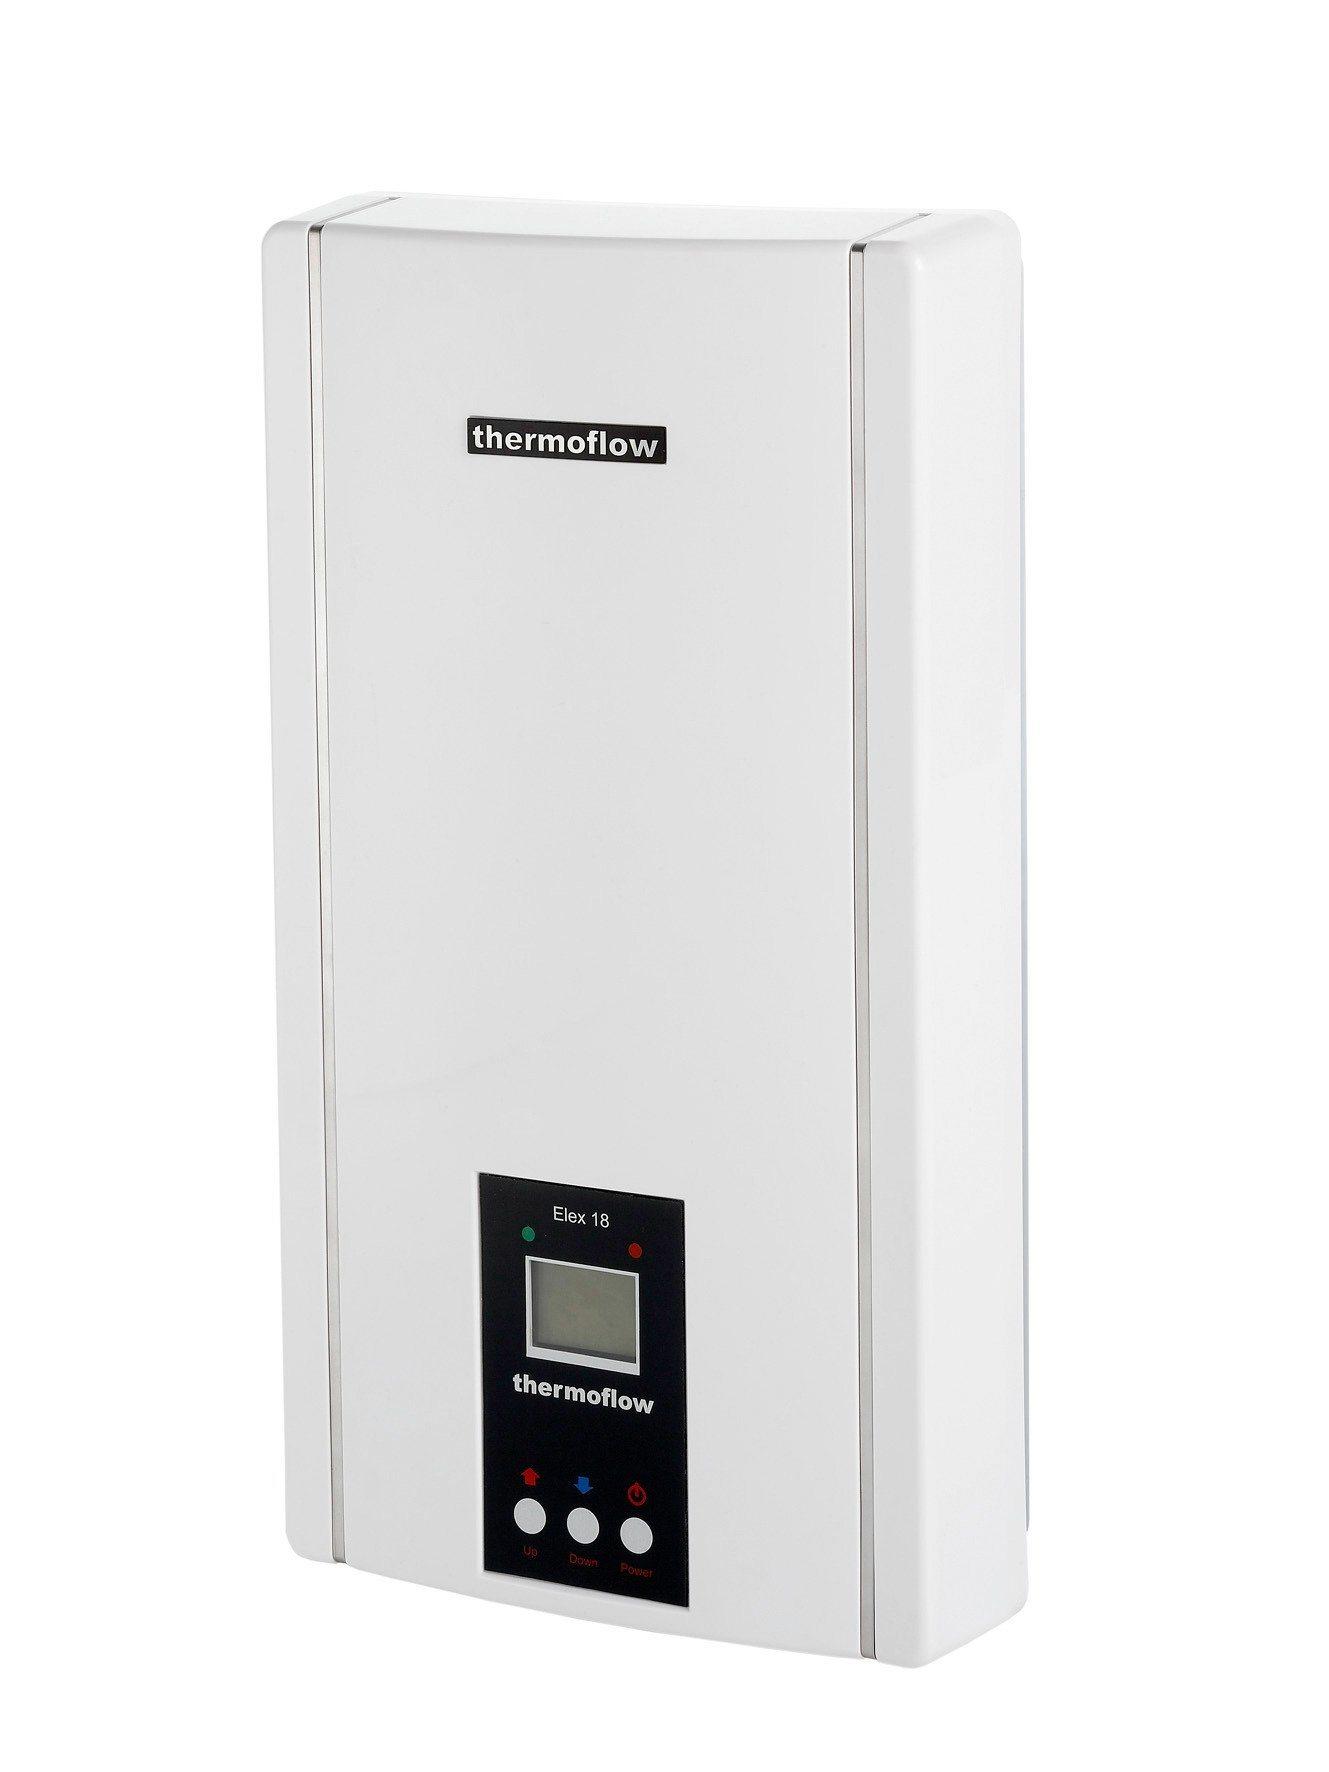 RESPEKTA Durchlauferhitzer »Thermoflow Elex 18/21/24« | Baumarkt > Heizung und Klima > Durchlauferhitzer | RESPEKTA